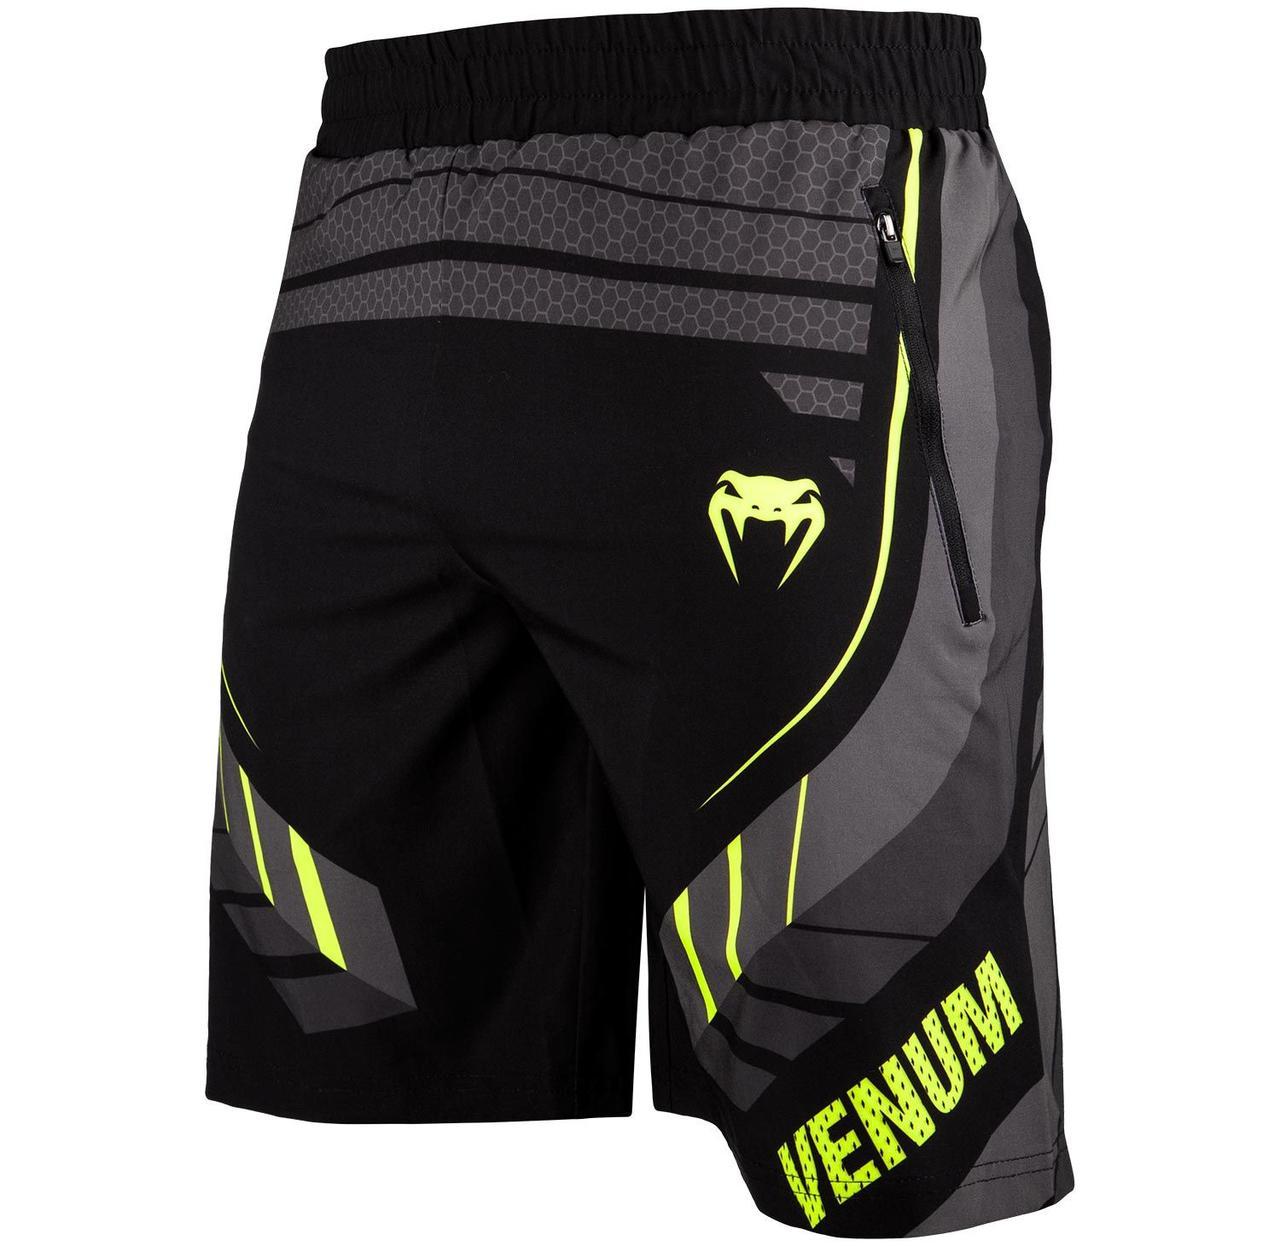 Шорты Venum Technical 2.0 Fitness Short Black Yellow